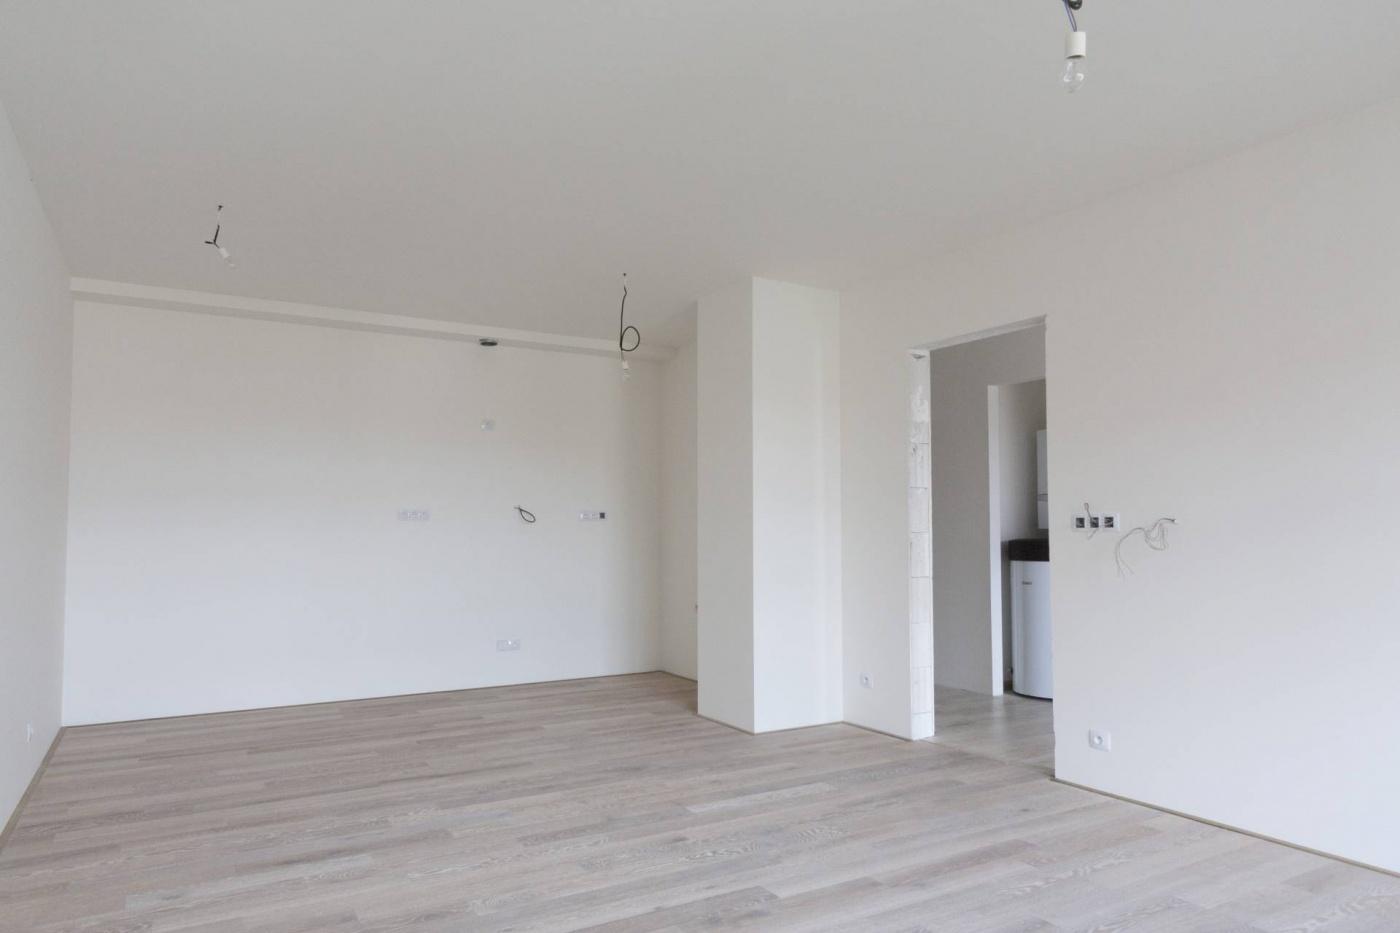 Půdní byt 2+kk, plocha 79 m², ulice Lumírova, Praha 2 - Vyšehrad, cena 7 490 000 Kč | 3